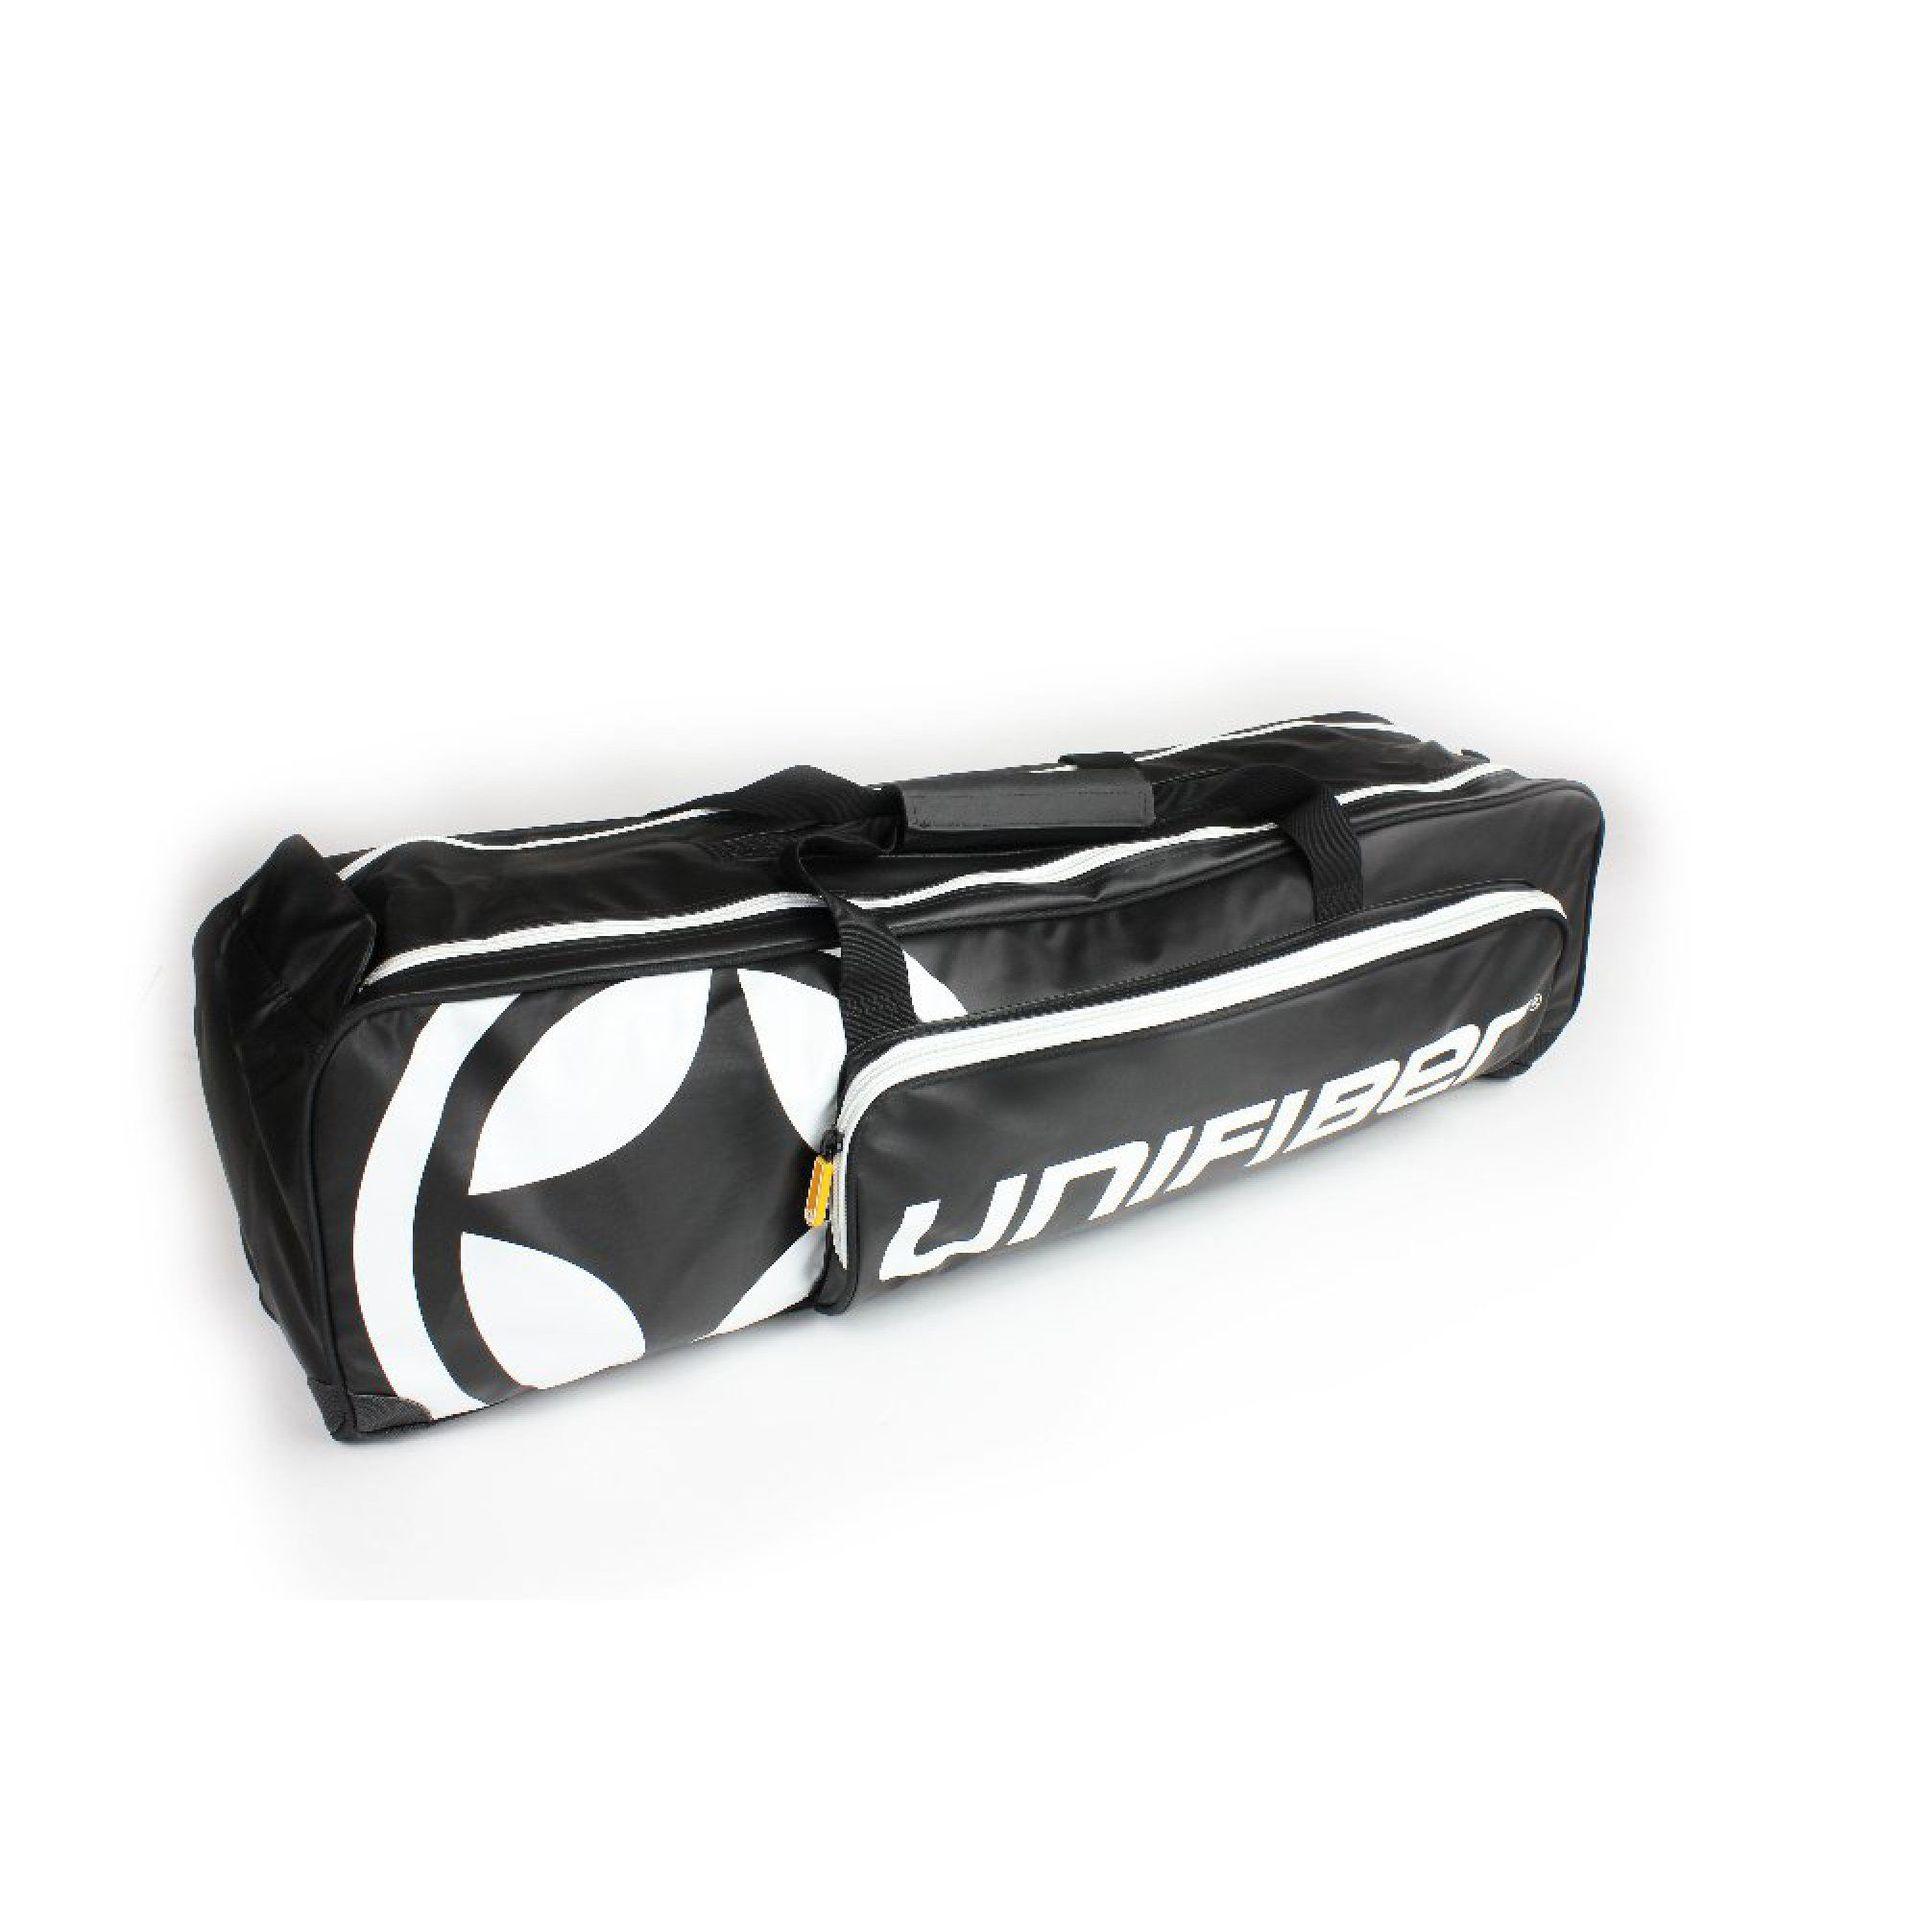 TORBA UNIFIBER BLACKLINE SMALL EQUIPMENT BAG